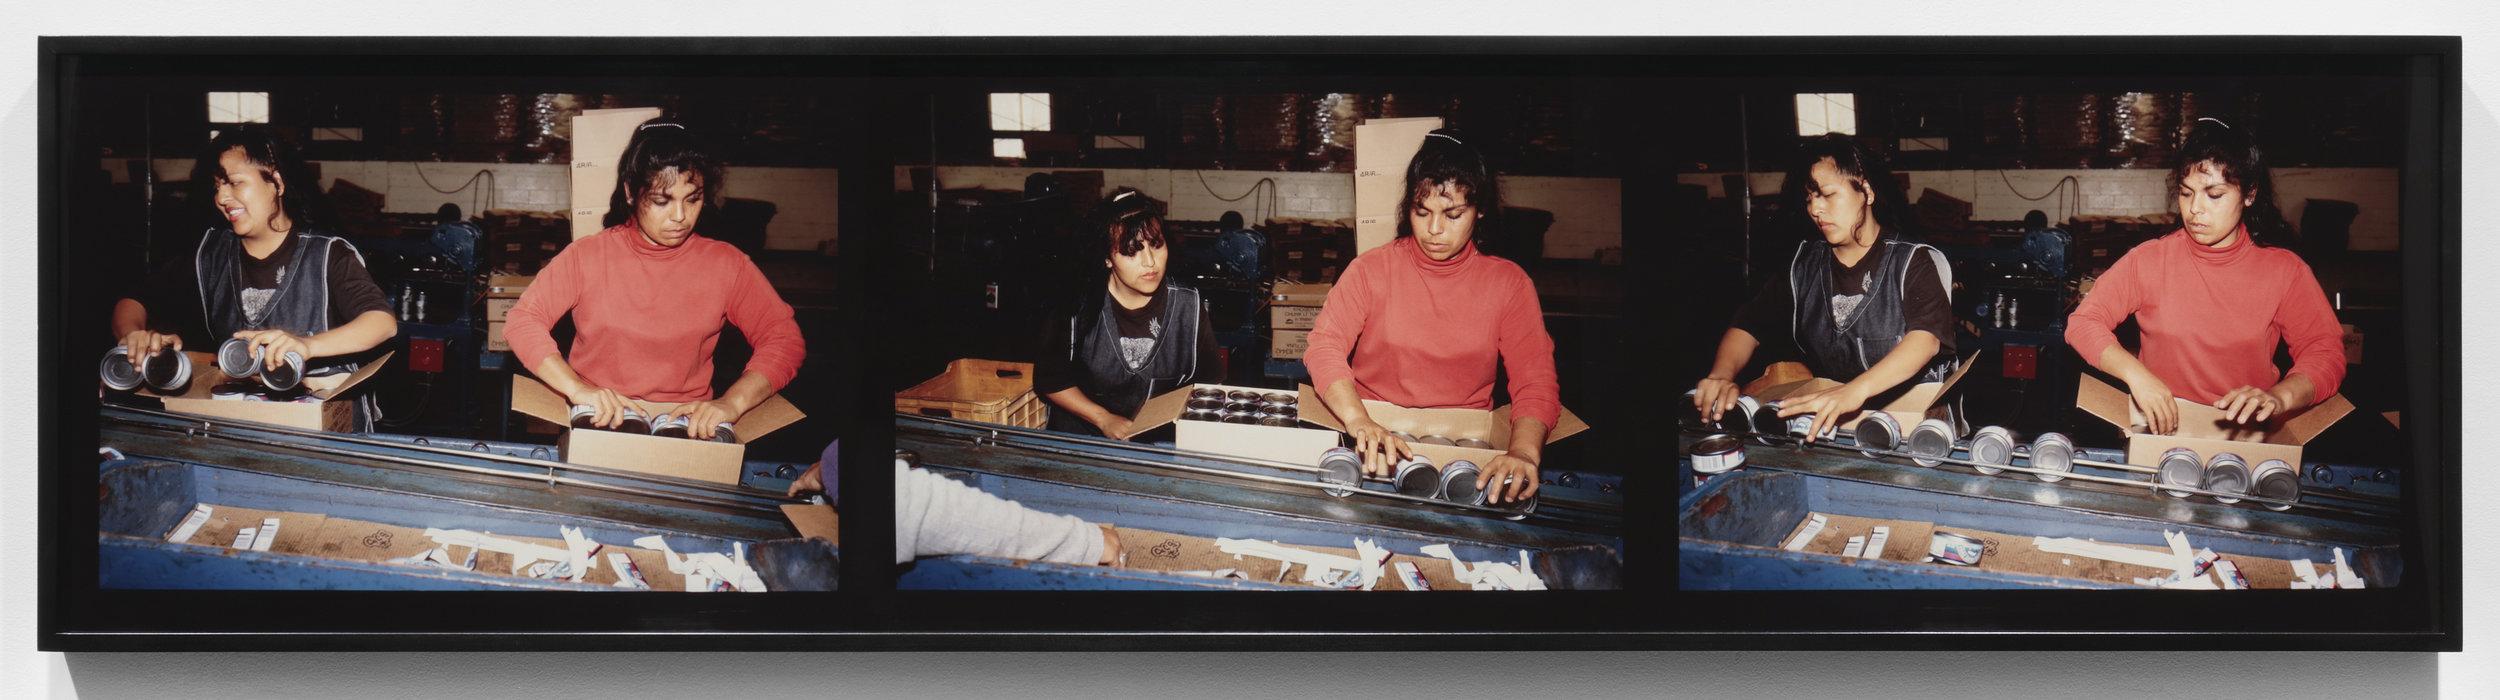 "Cannery, Sanzal from ""Dead Letter Office"", 1996-1997 [Enlatadora de atún, Sanzal.] Triptych; cibachrome prints Frame: 19 7/8 x 78 1/4 x 2 1/2 in. (50.5 x 198.8 x 6.3 cm) (22685)"